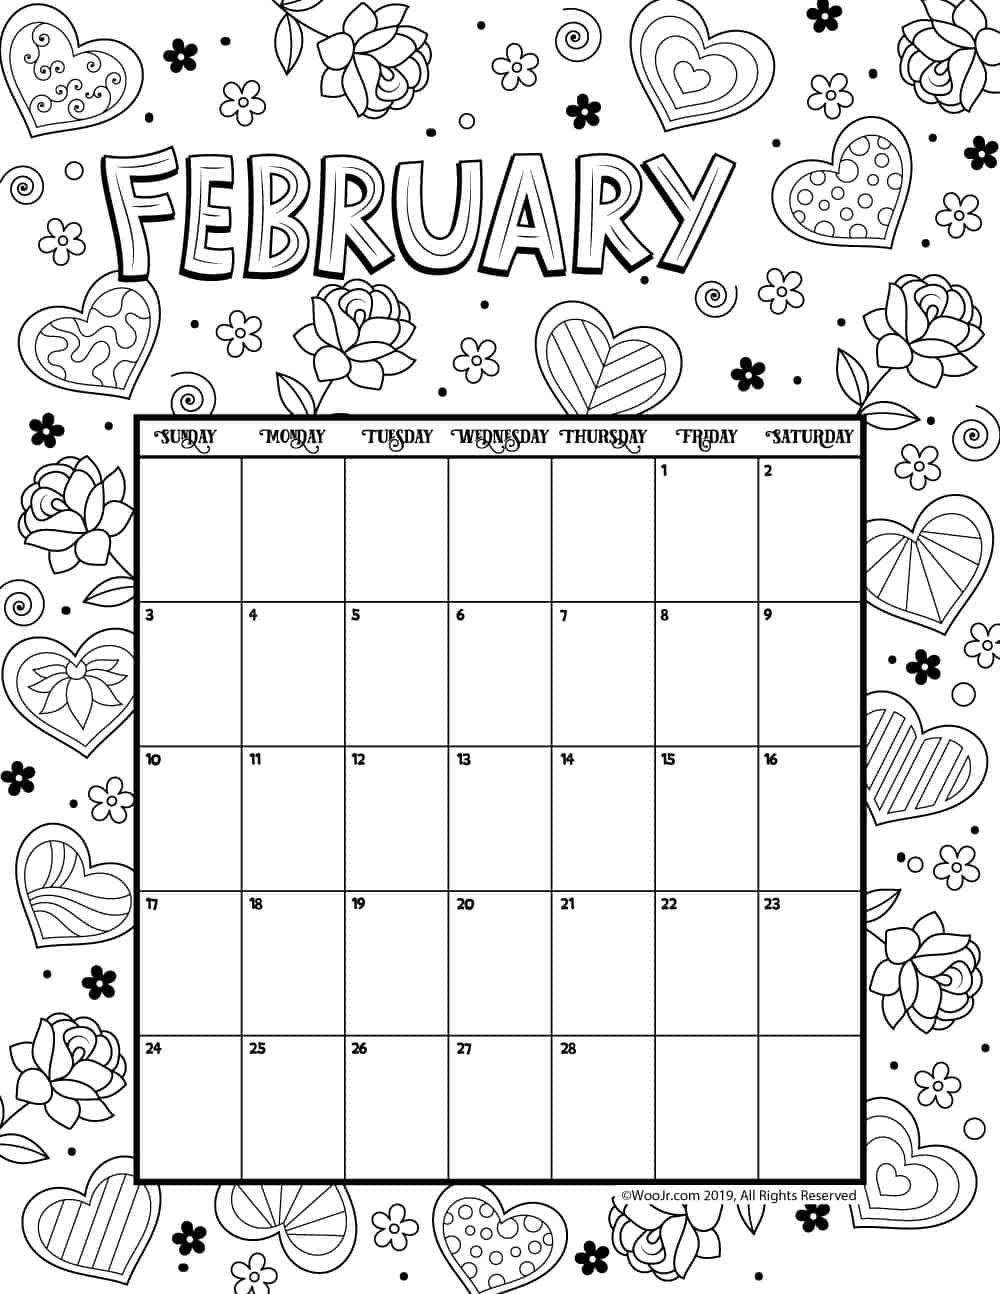 February 2019 Coloring Calendar For Kids Calendar Of February